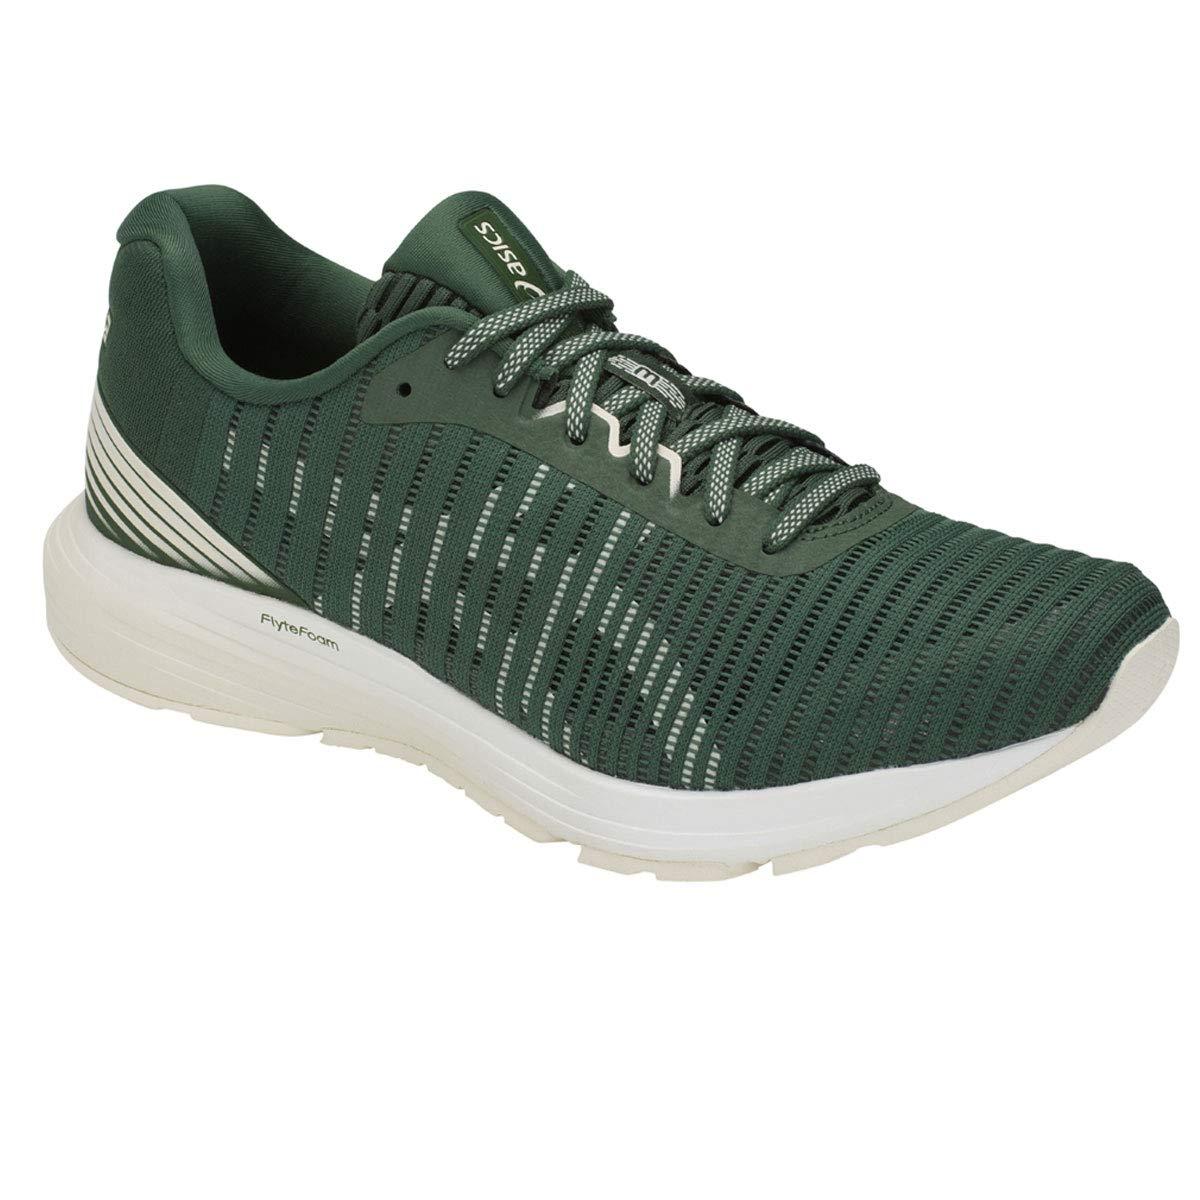 ASICS DynaFlyte 3 Running Shoes For Men